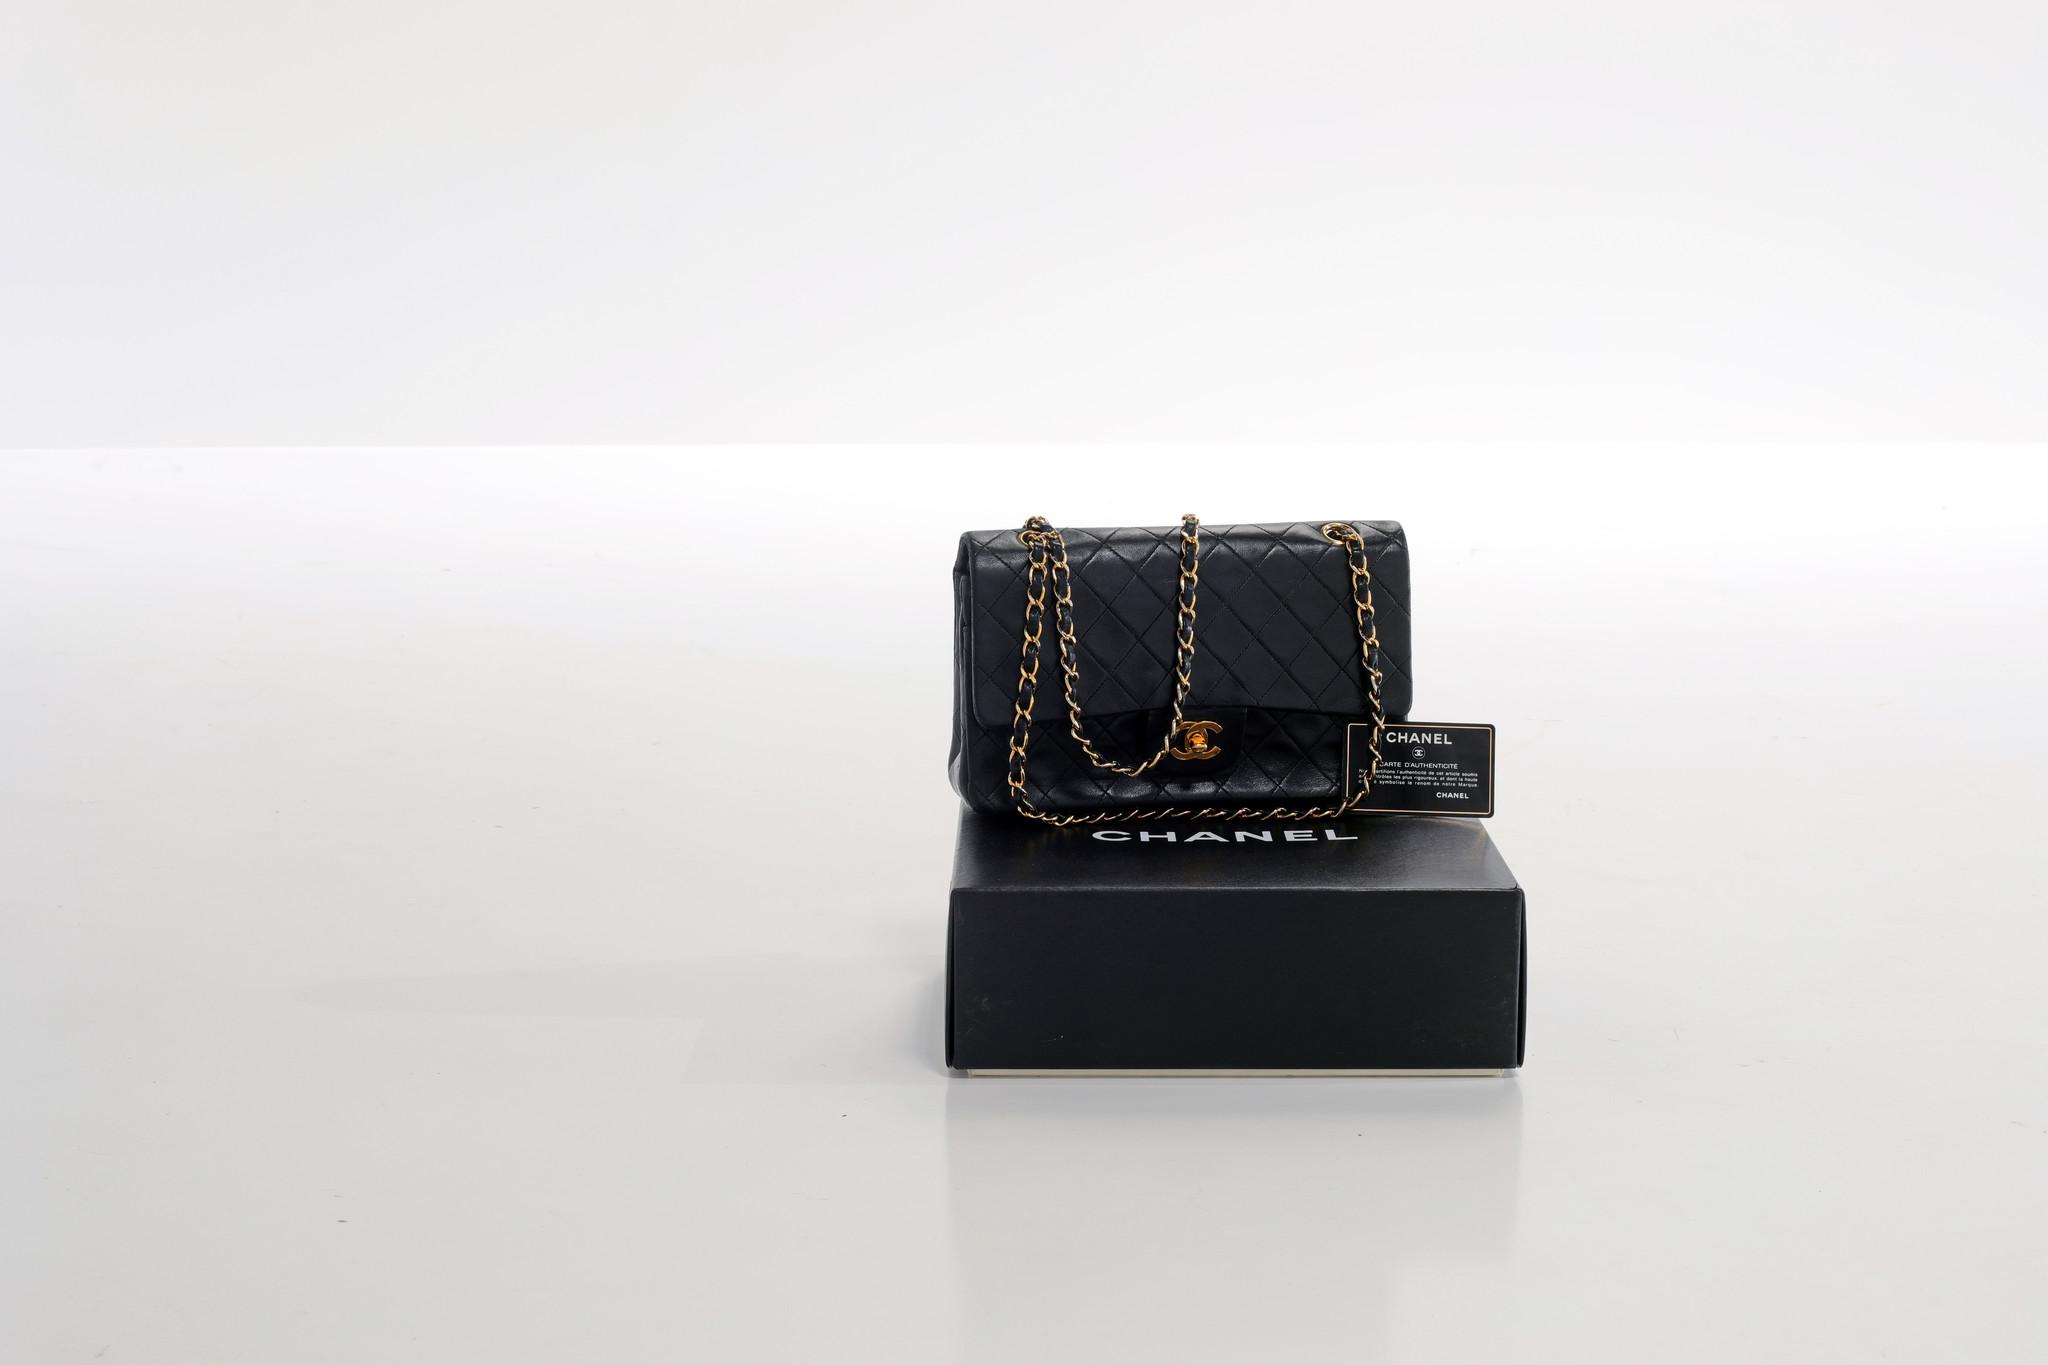 Vintage Chanel medium double flap bag